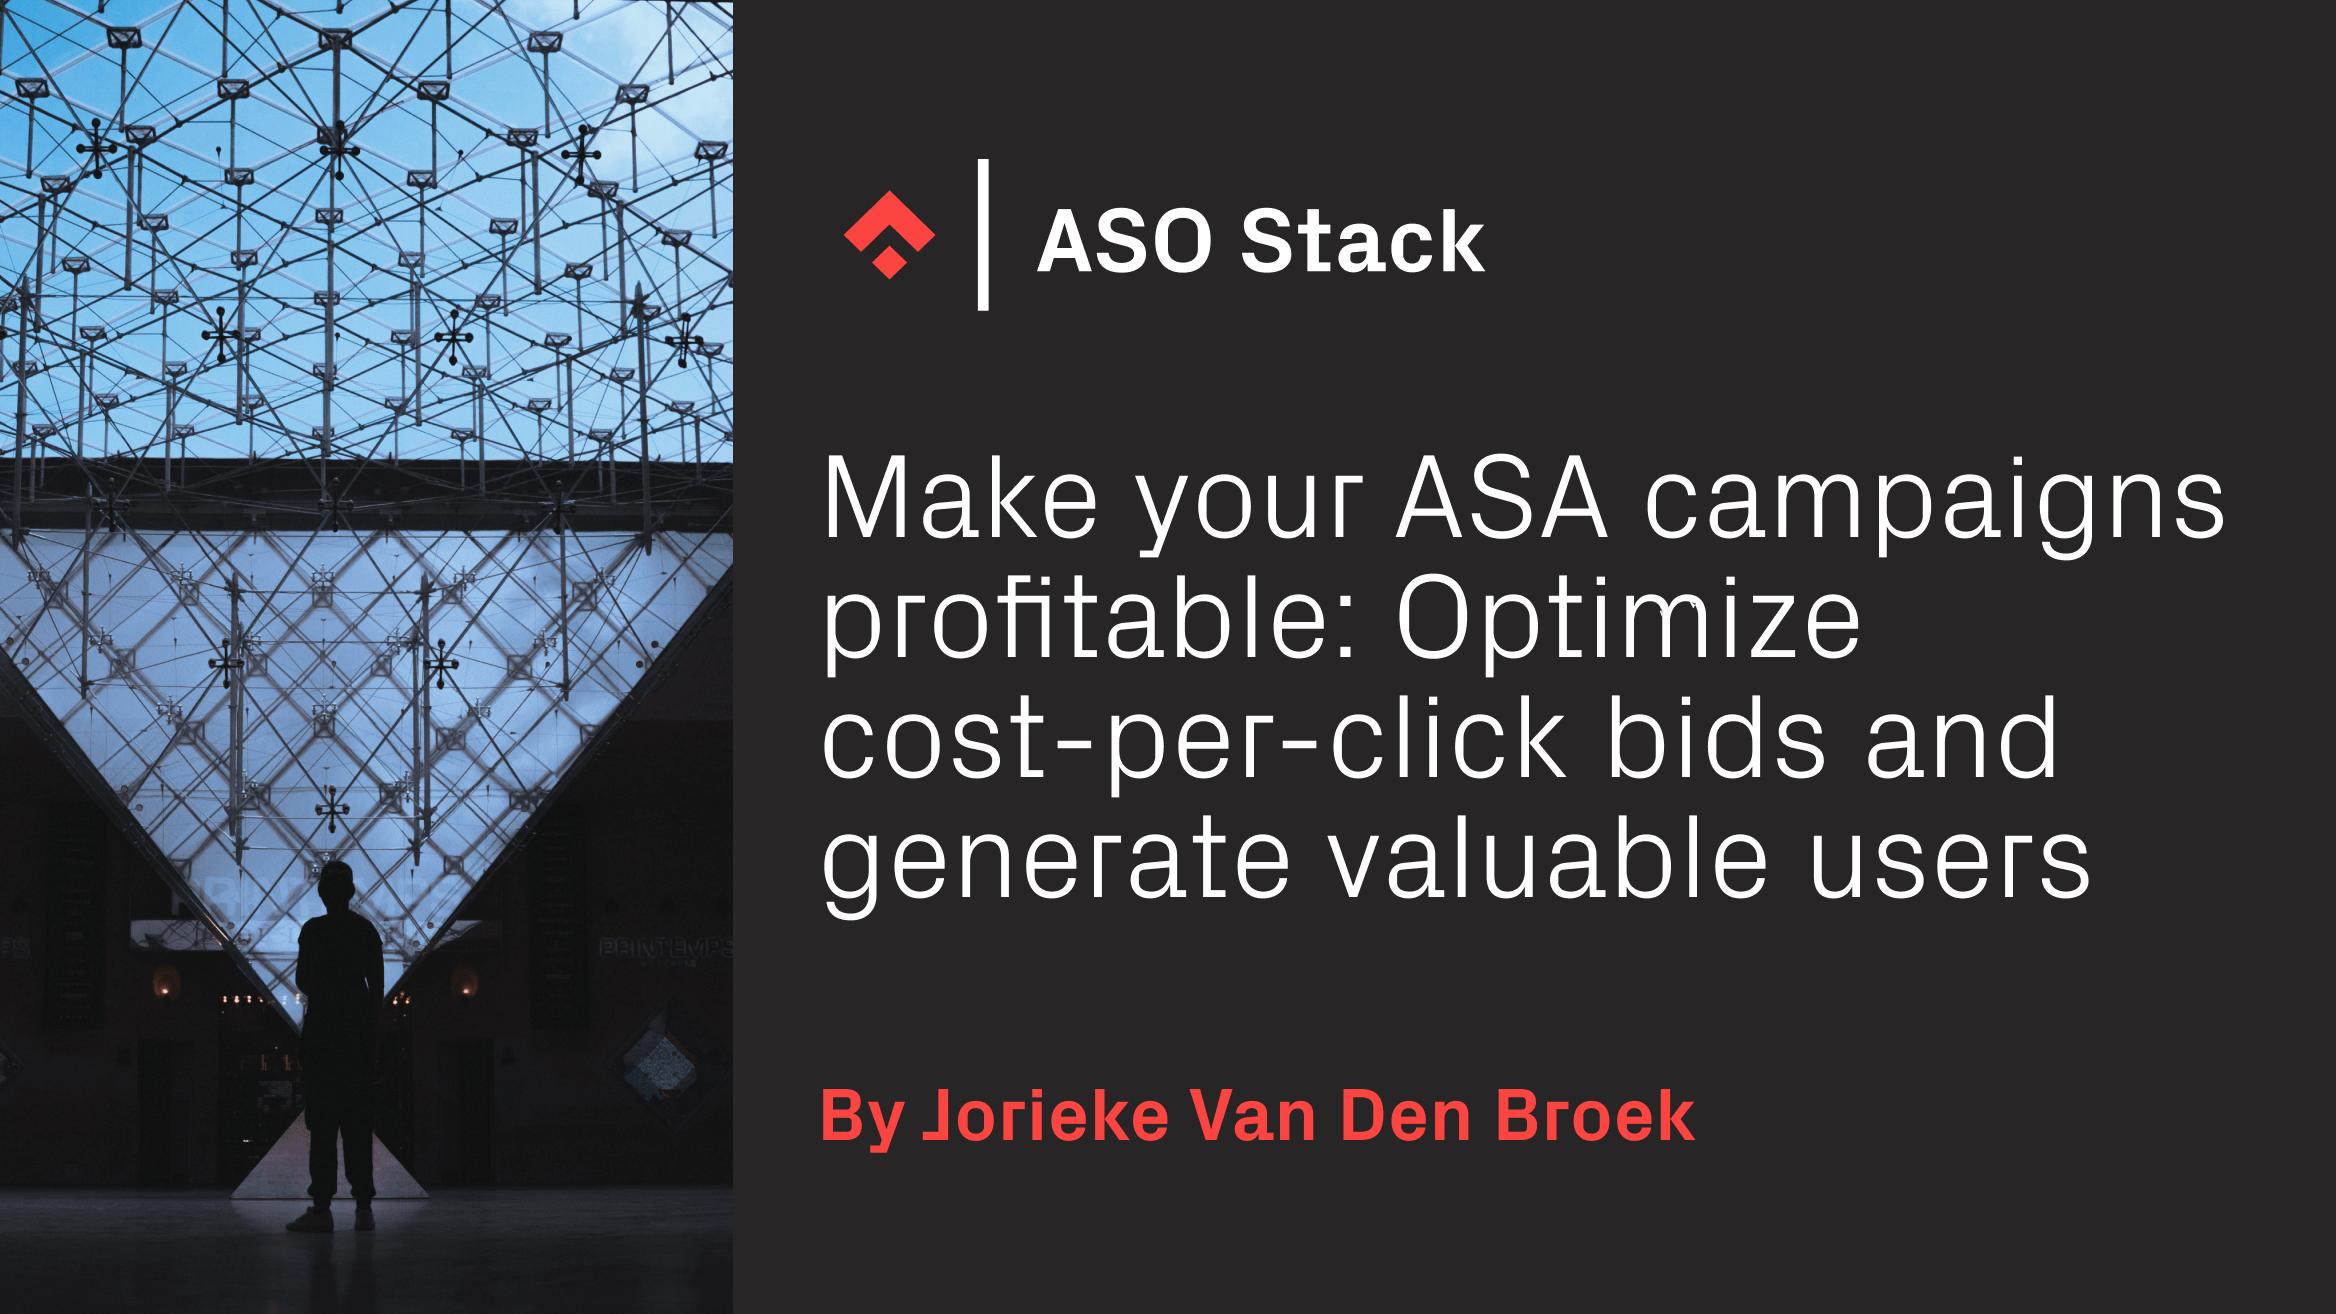 make your ASA campaigns profitable